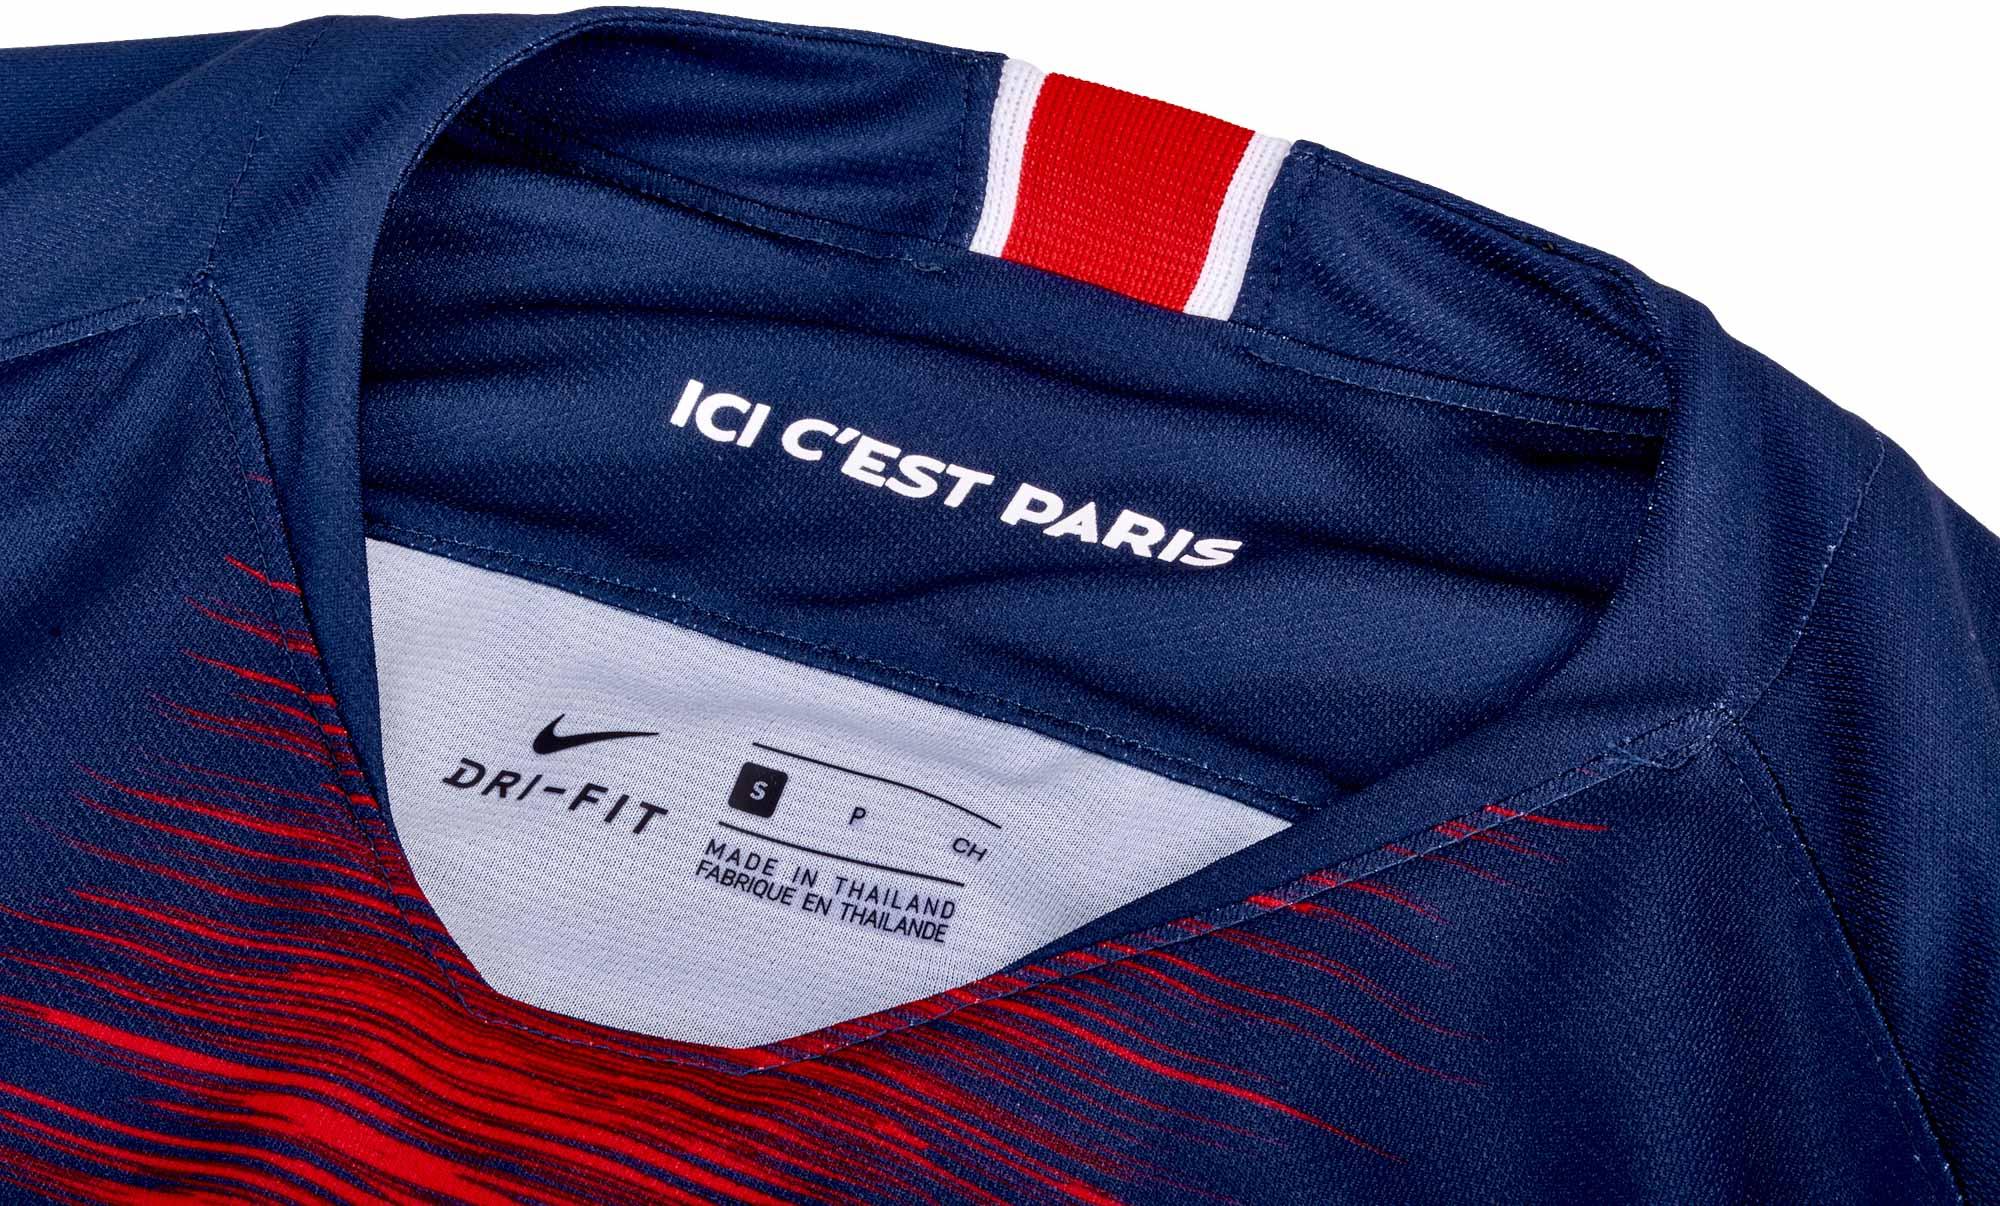 lowest price 16cd6 c9d28 Nike Kylian Mbappe PSG Home Jersey 2018-19 - SoccerPro